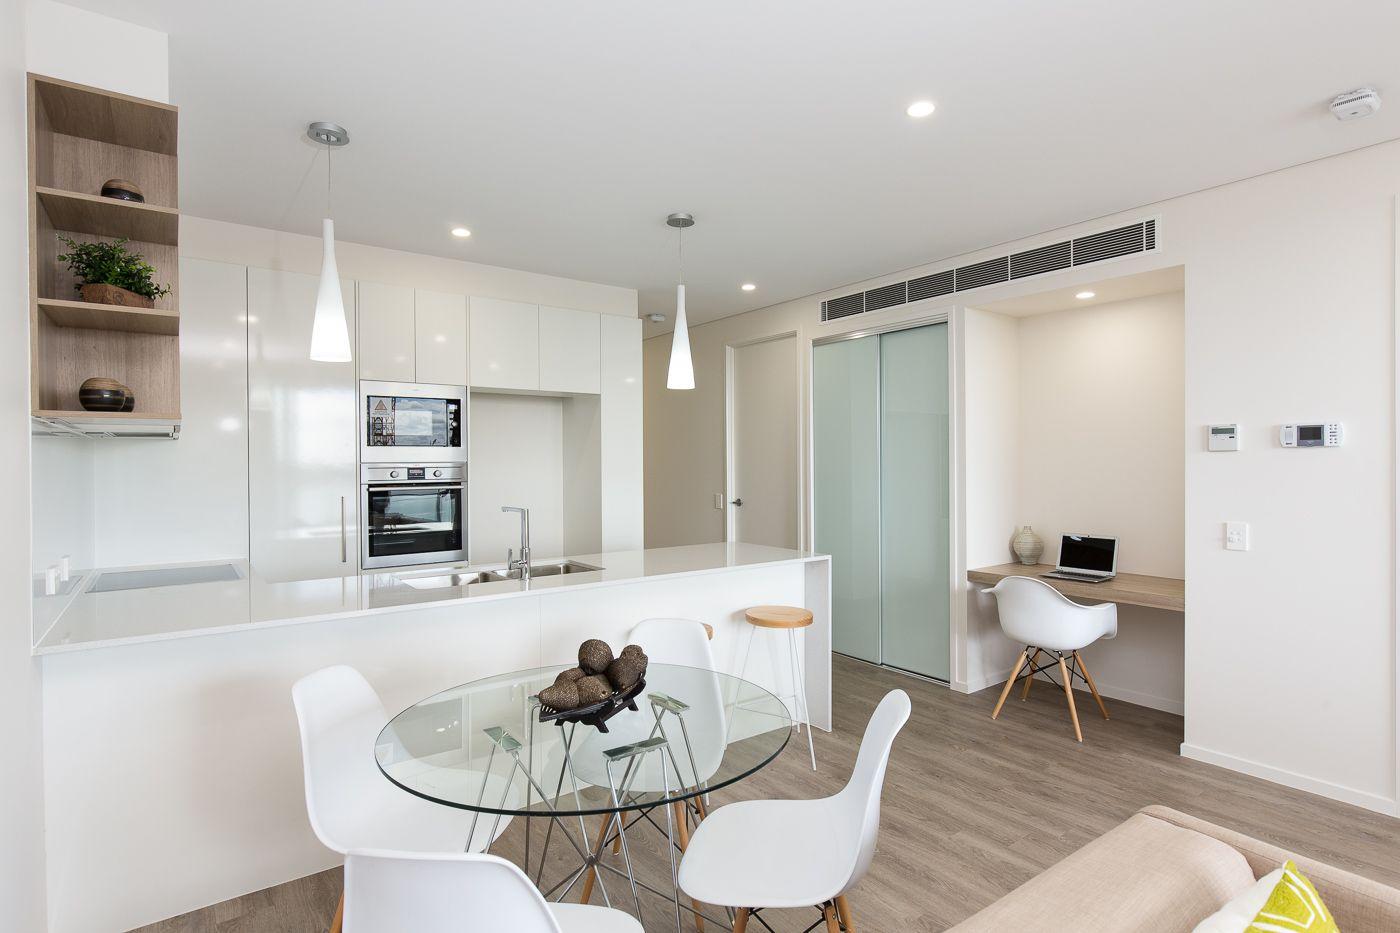 8/48 Cintra Road, Bowen Hills QLD 4006, Image 0